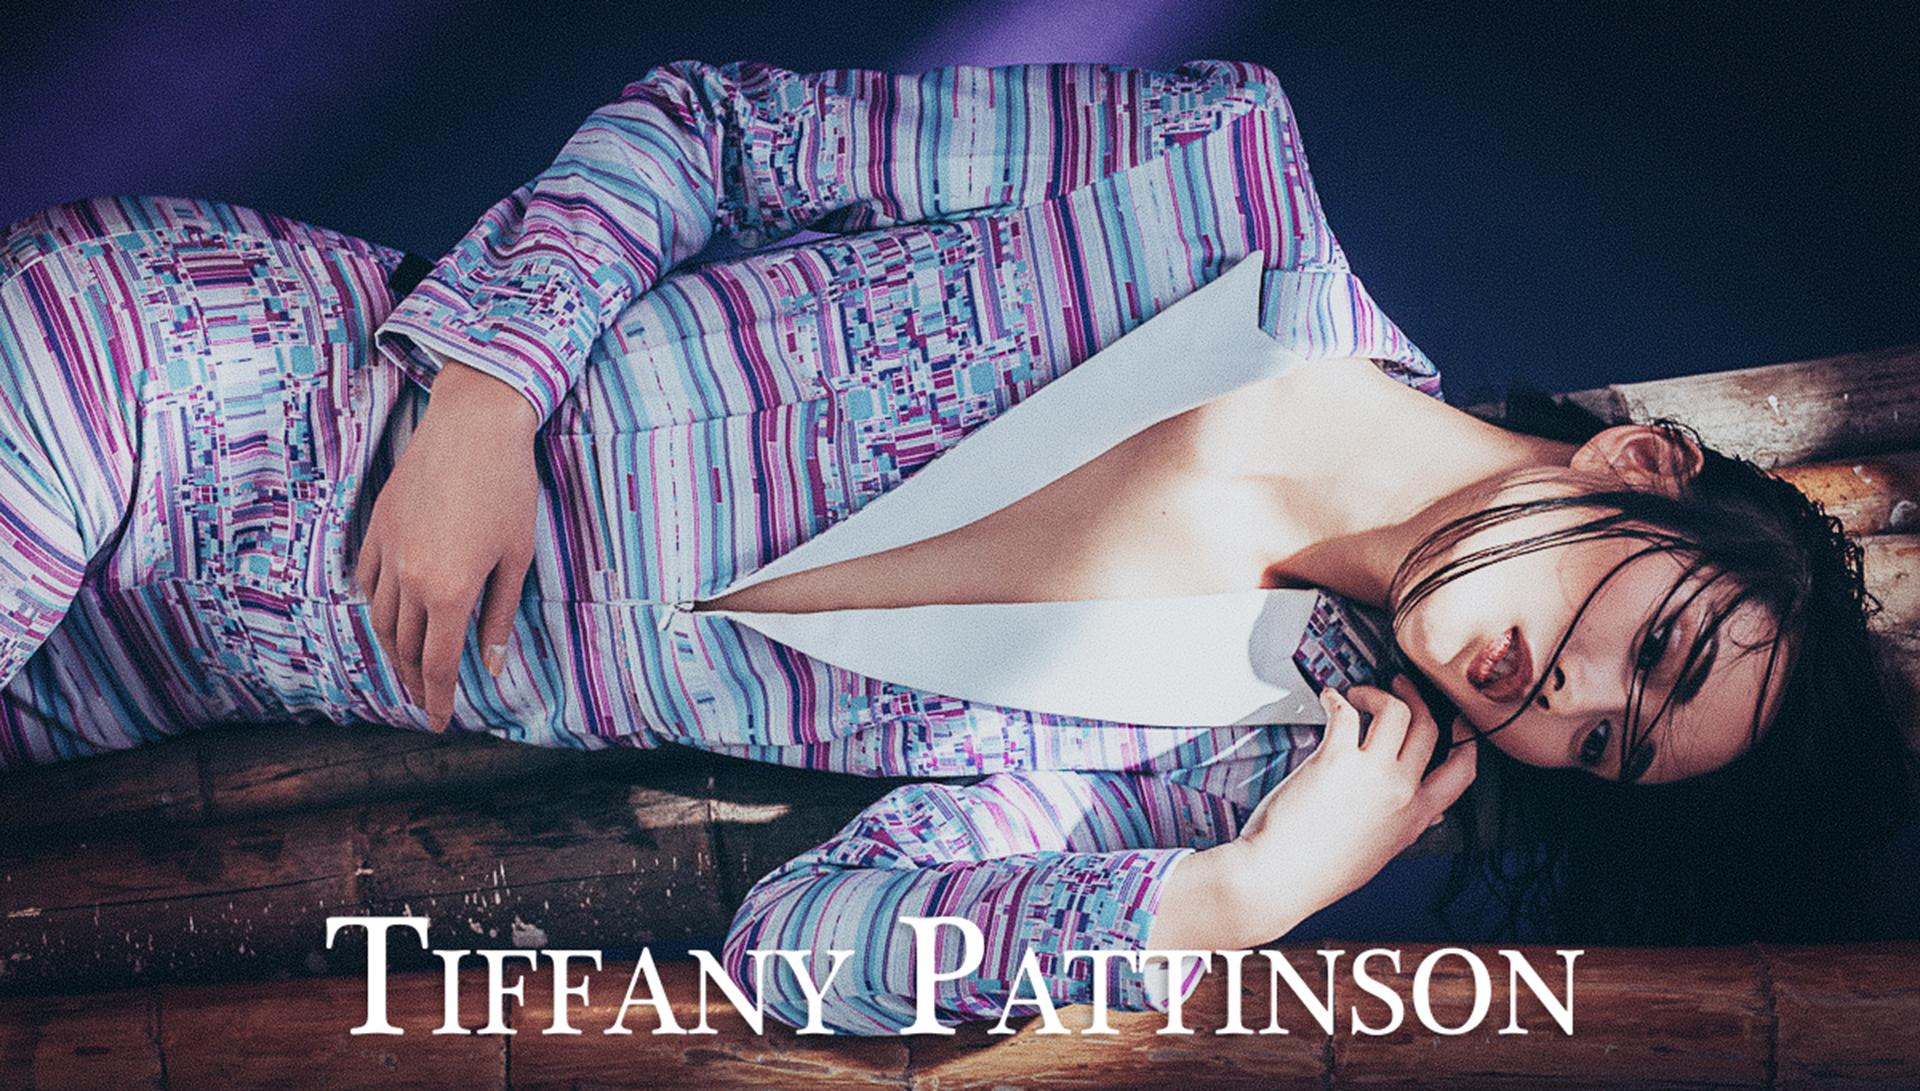 Digitaldelia collection - Tiffany Pattinson